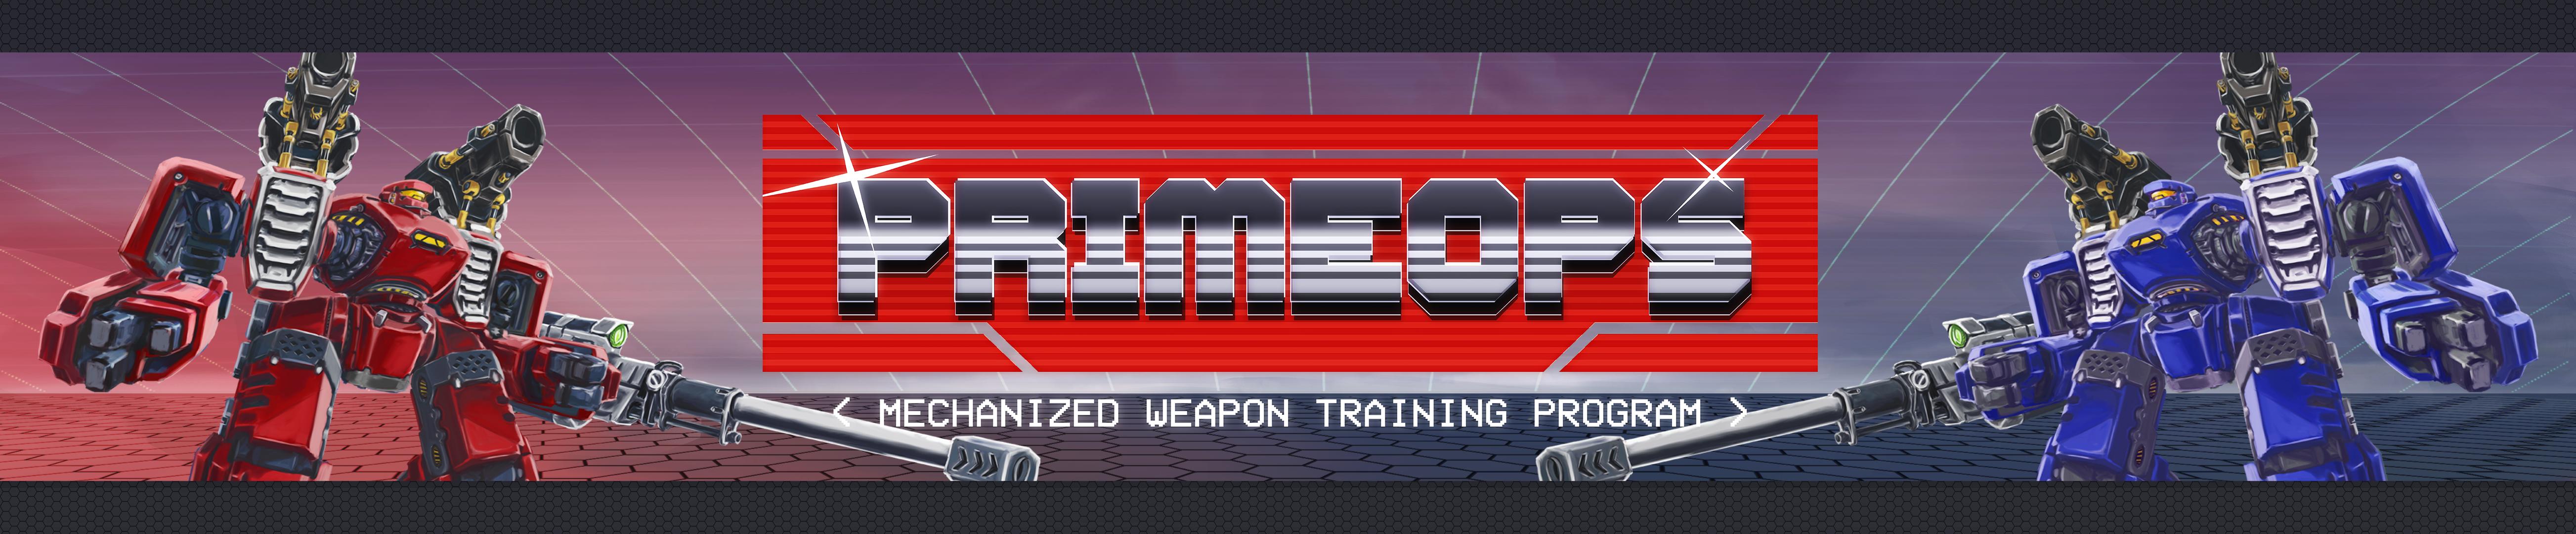 PRIMEOPS - Mechanized Weapon Training Program